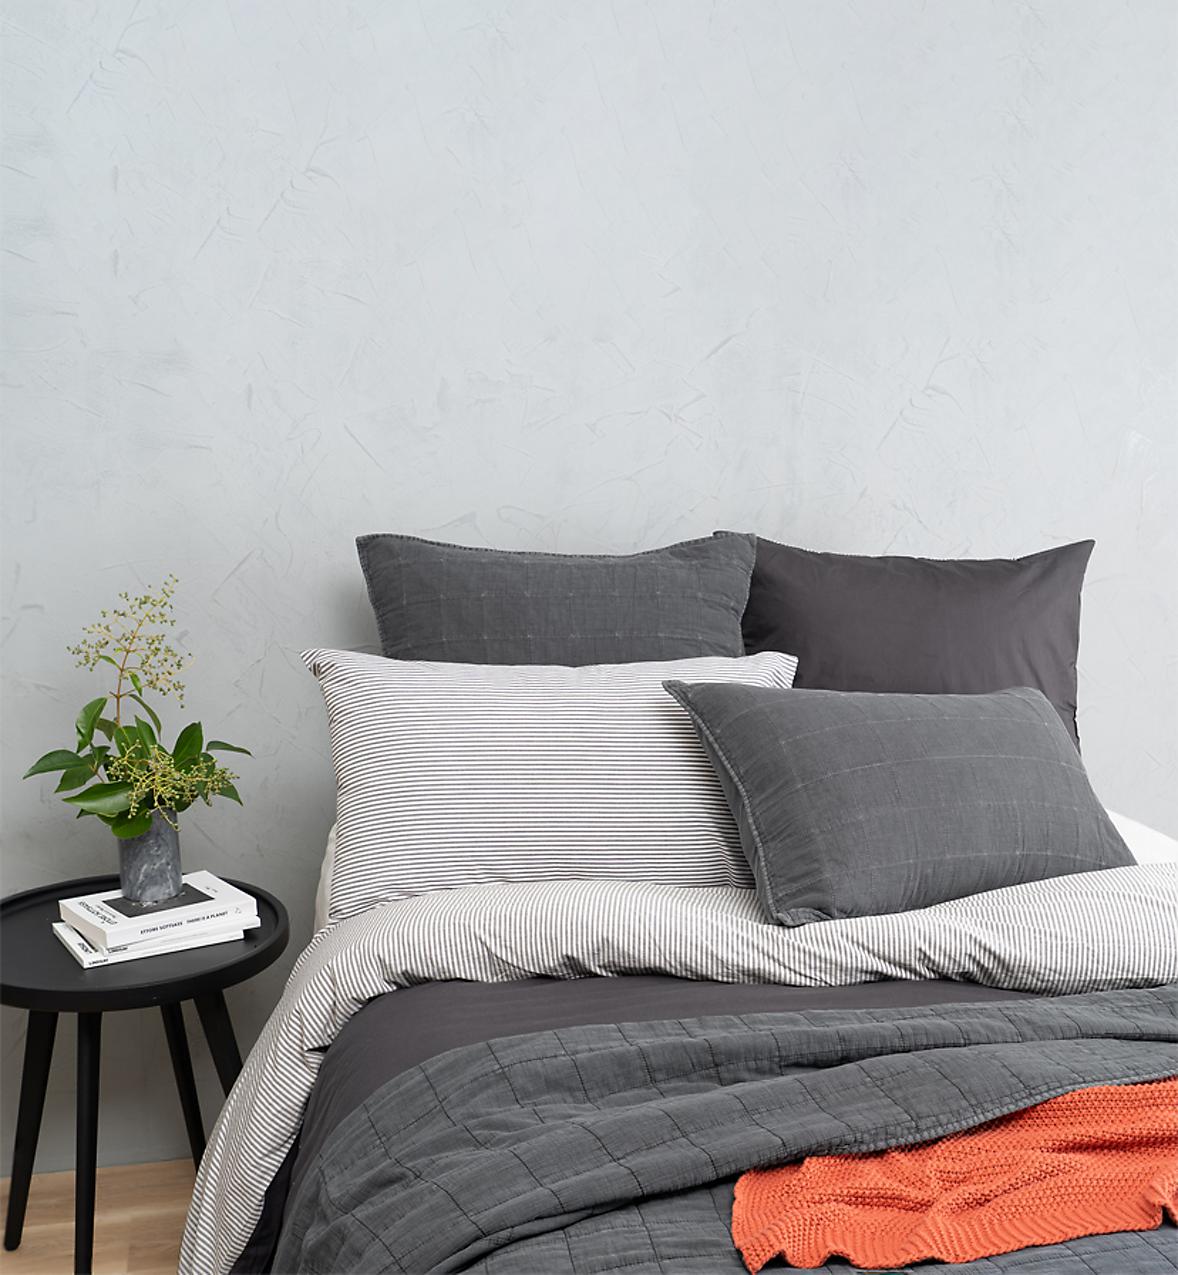 Shop winter bedding